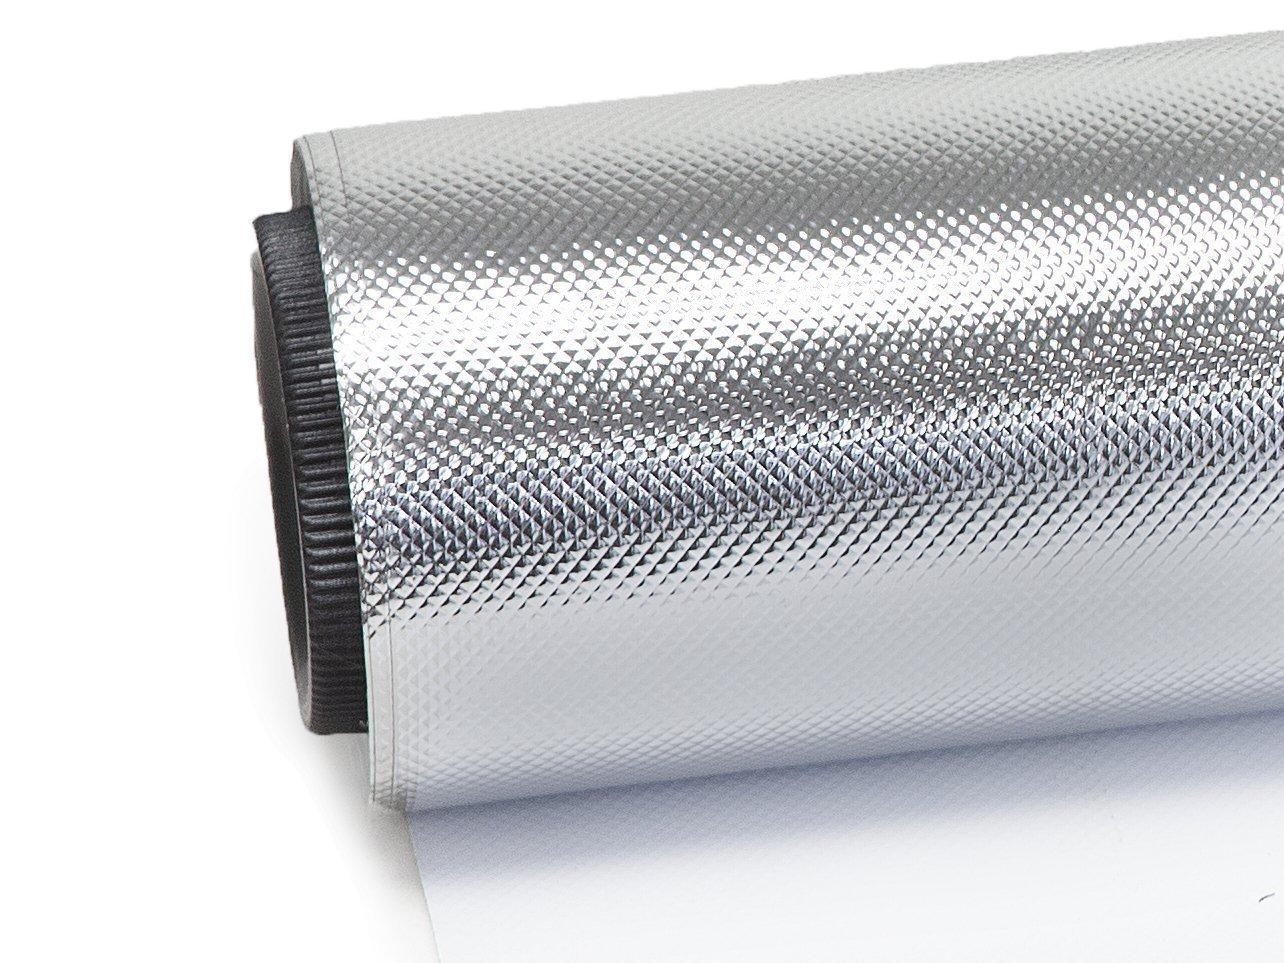 247Garden Diamond Silver Film Foil Roll Reflective Mylar Hydroponic (4 ft x 50 ft)